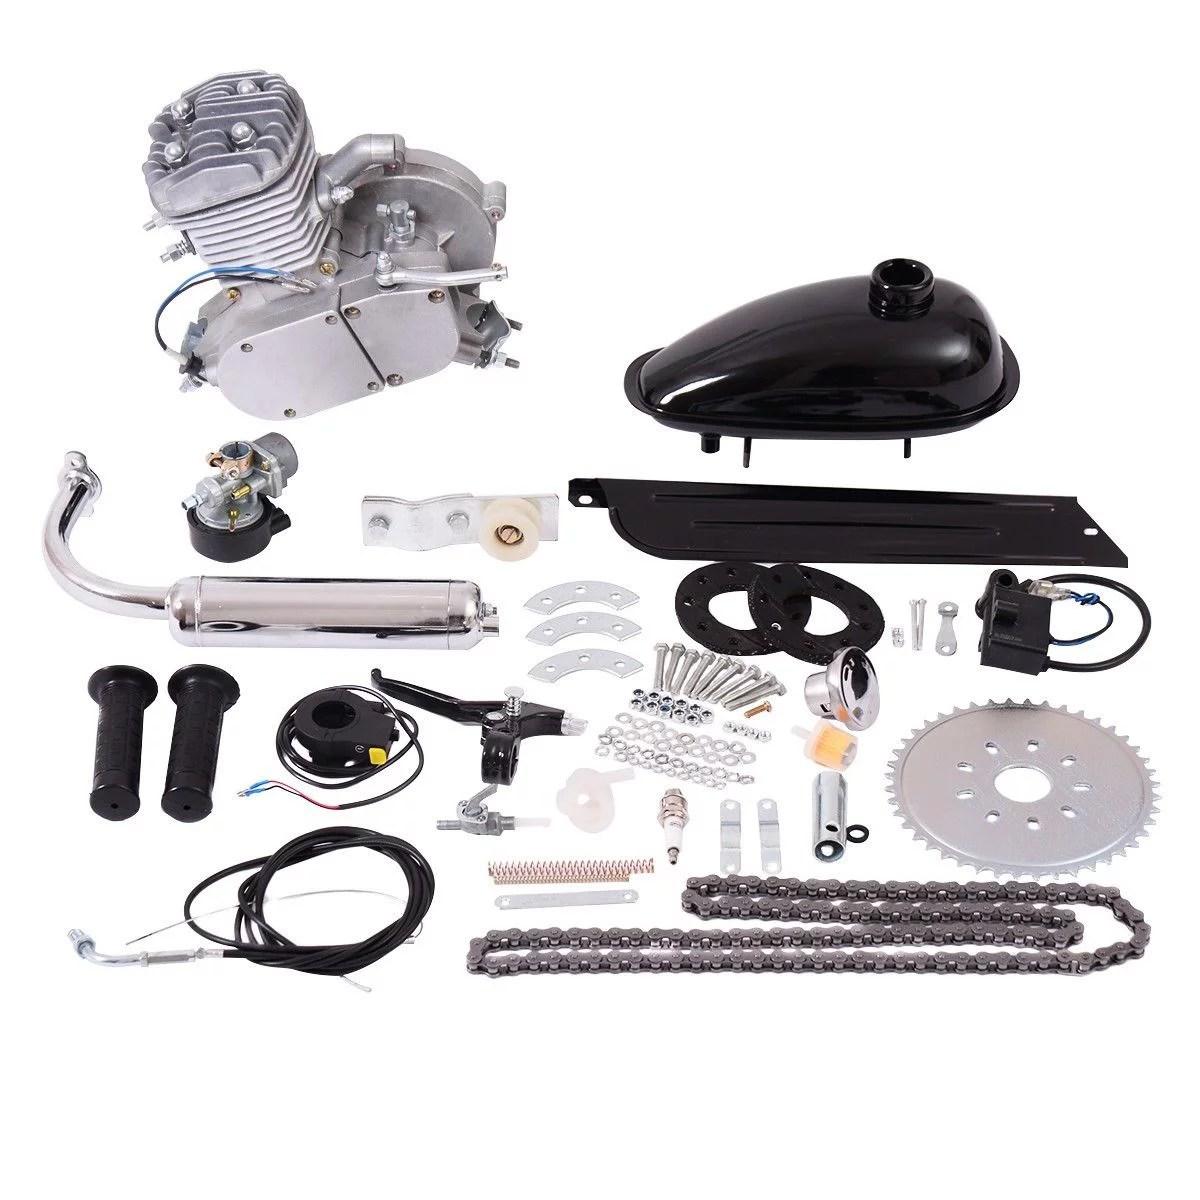 hight resolution of costway 80cc 2 stroke bicycle gasoline engine motor kit diy motorized bike silver walmart com